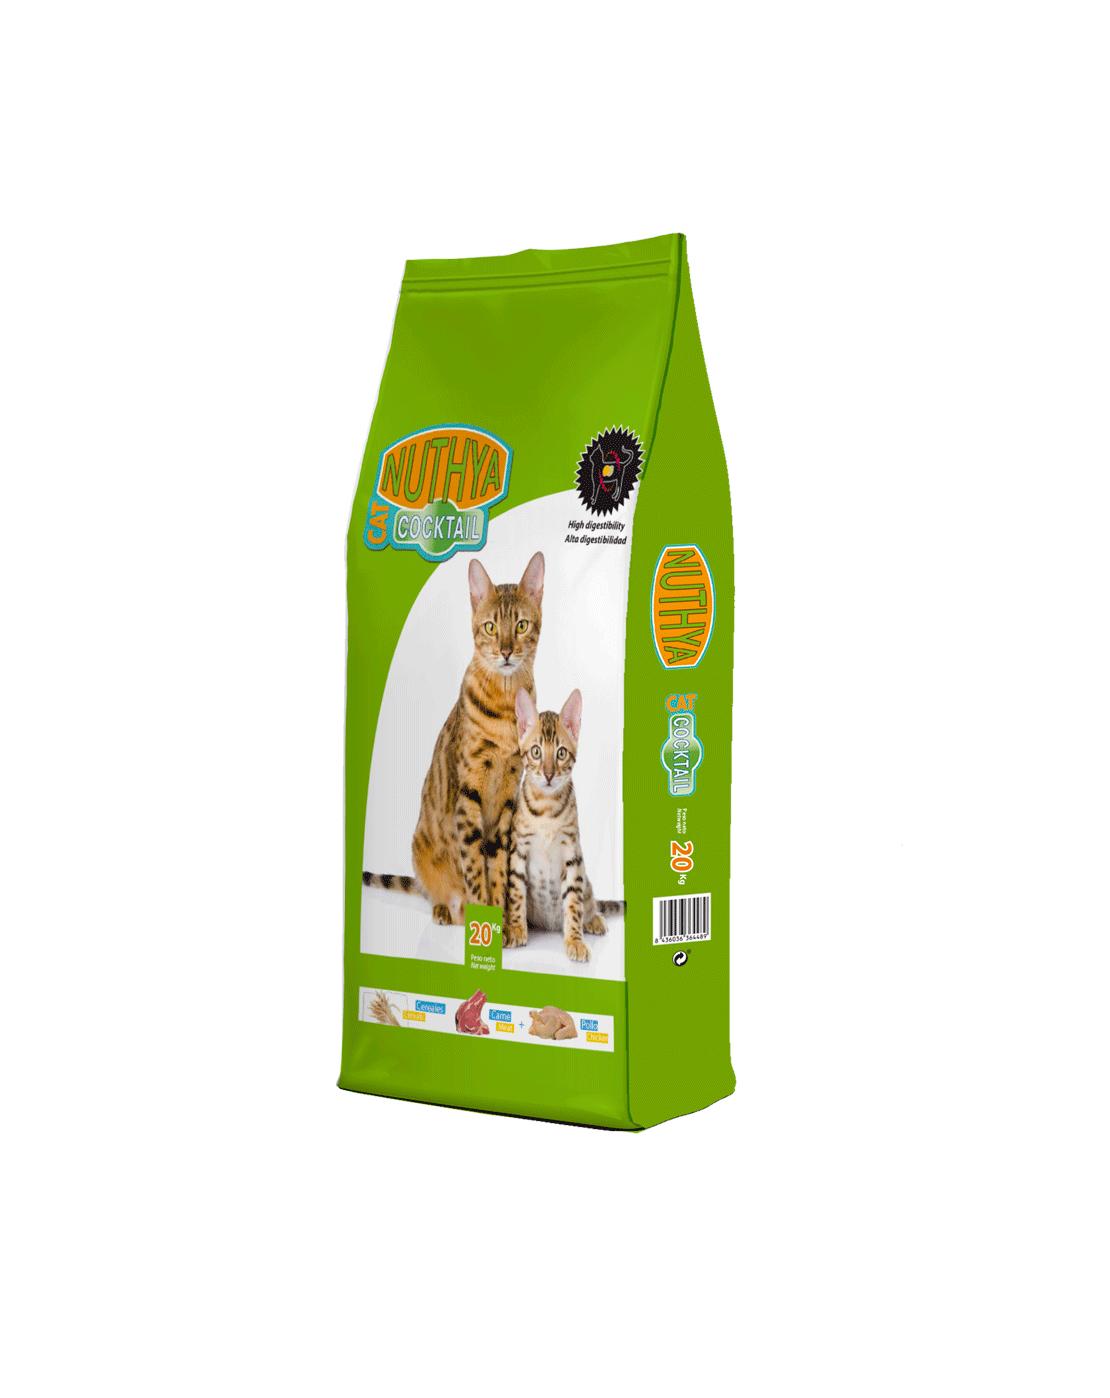 Nuthya Cat Cocktail Nugape